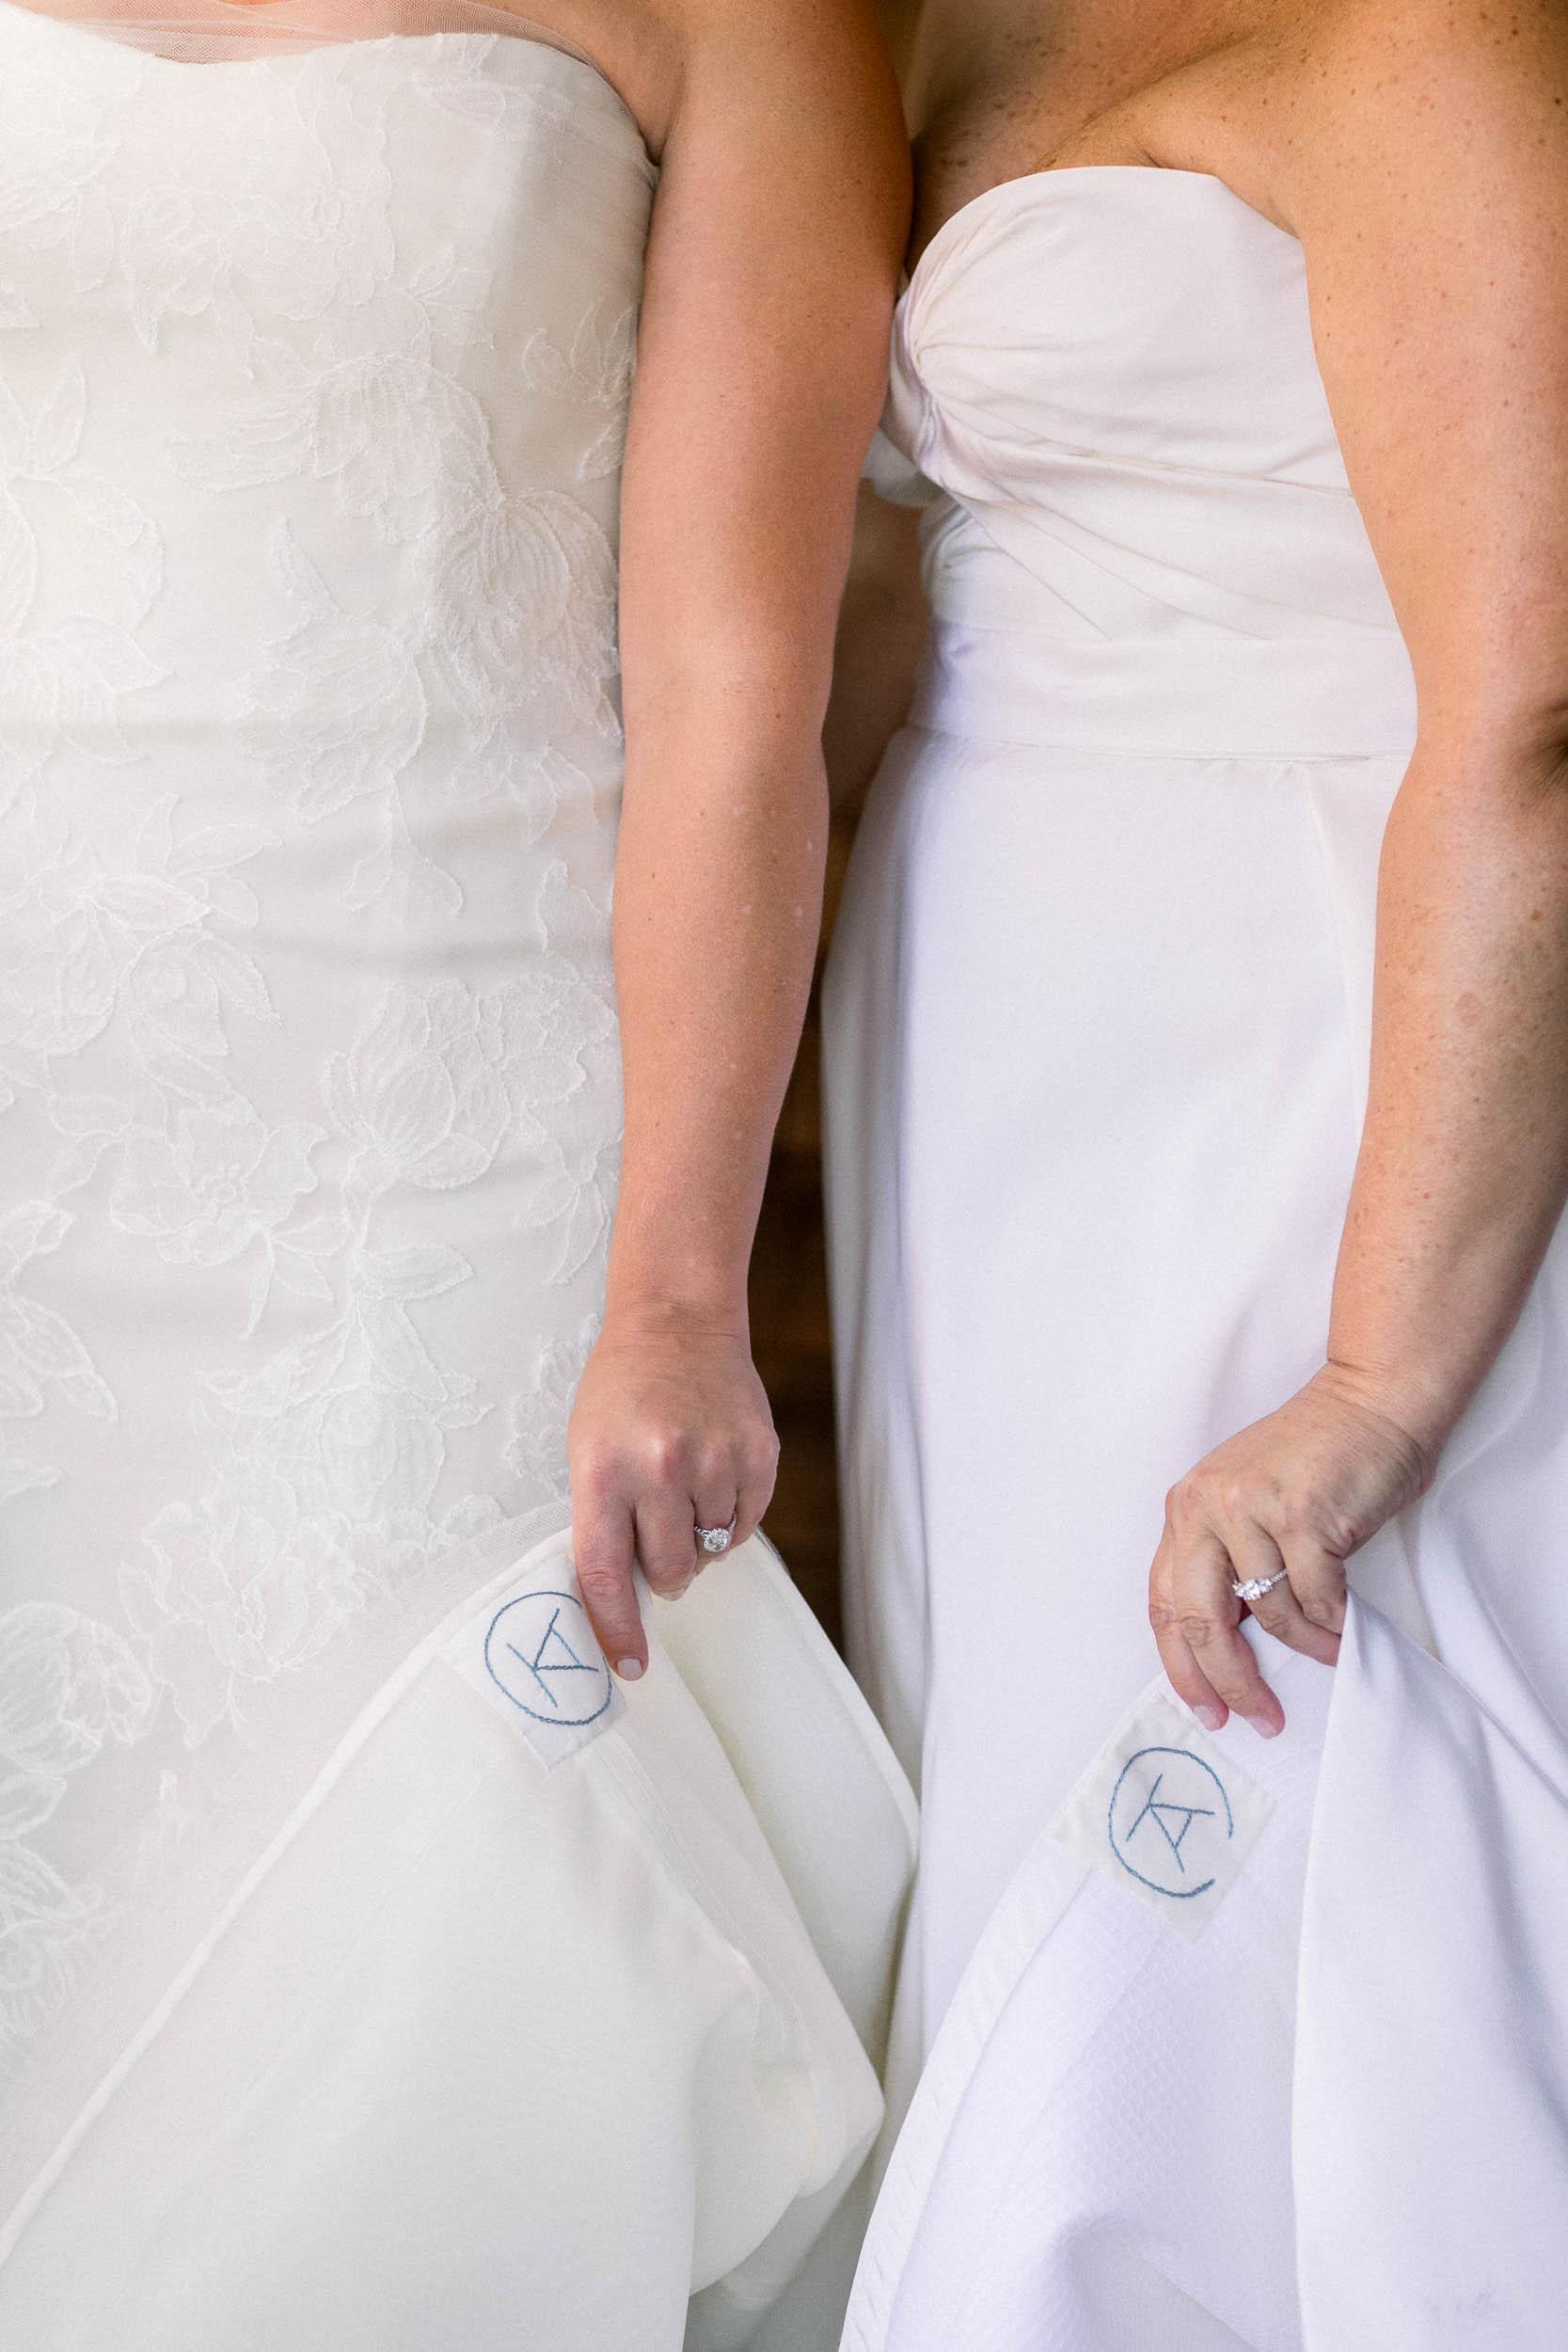 092218ER114_Sausalito Yacht Club Wedding_Buena Lane Photography.jpg